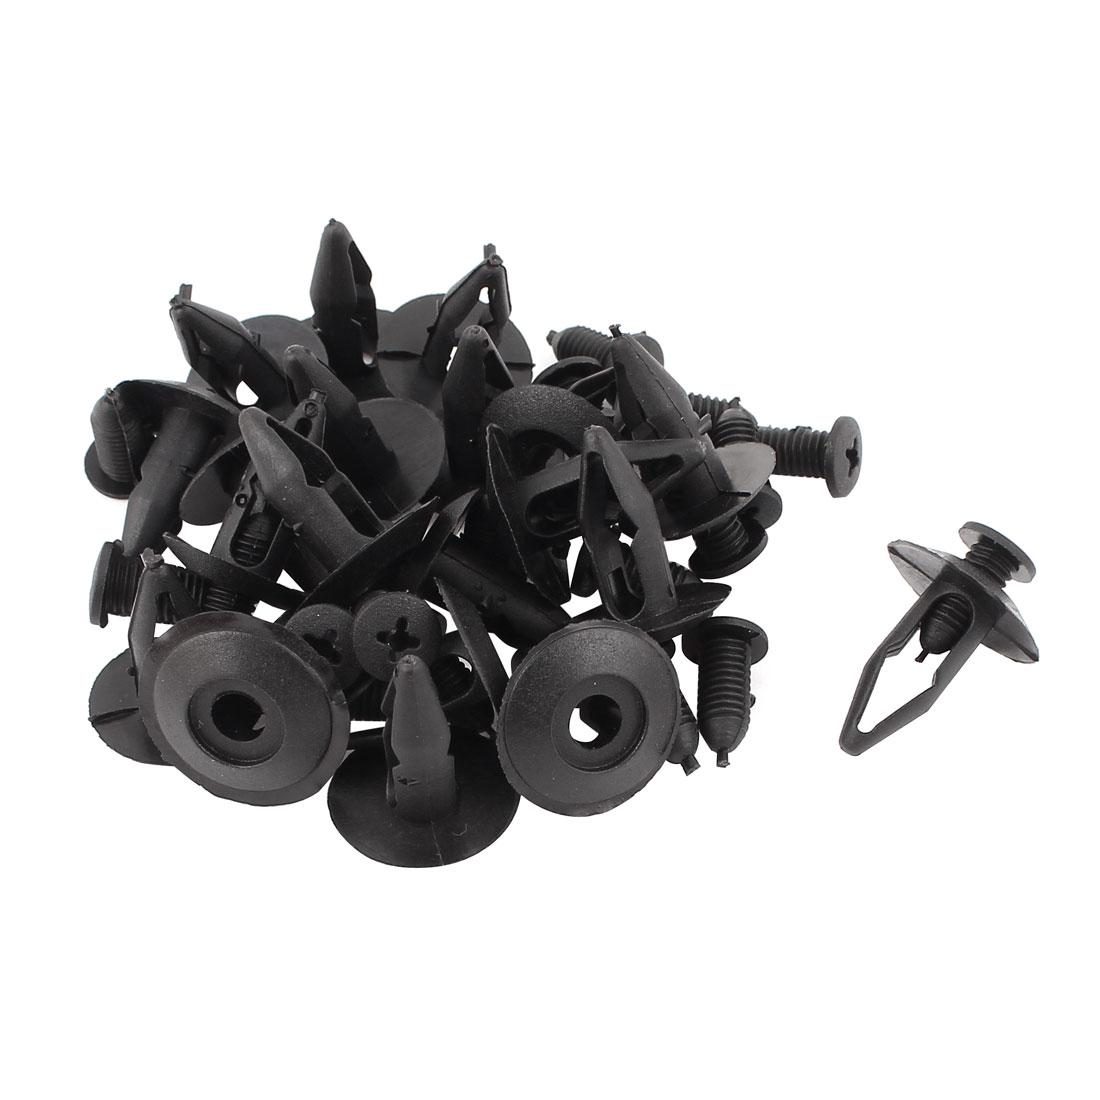 20 Pcs Black Plastic Rivets Fastener Clip 8mm x 20mm x 20mm for Car Bumper